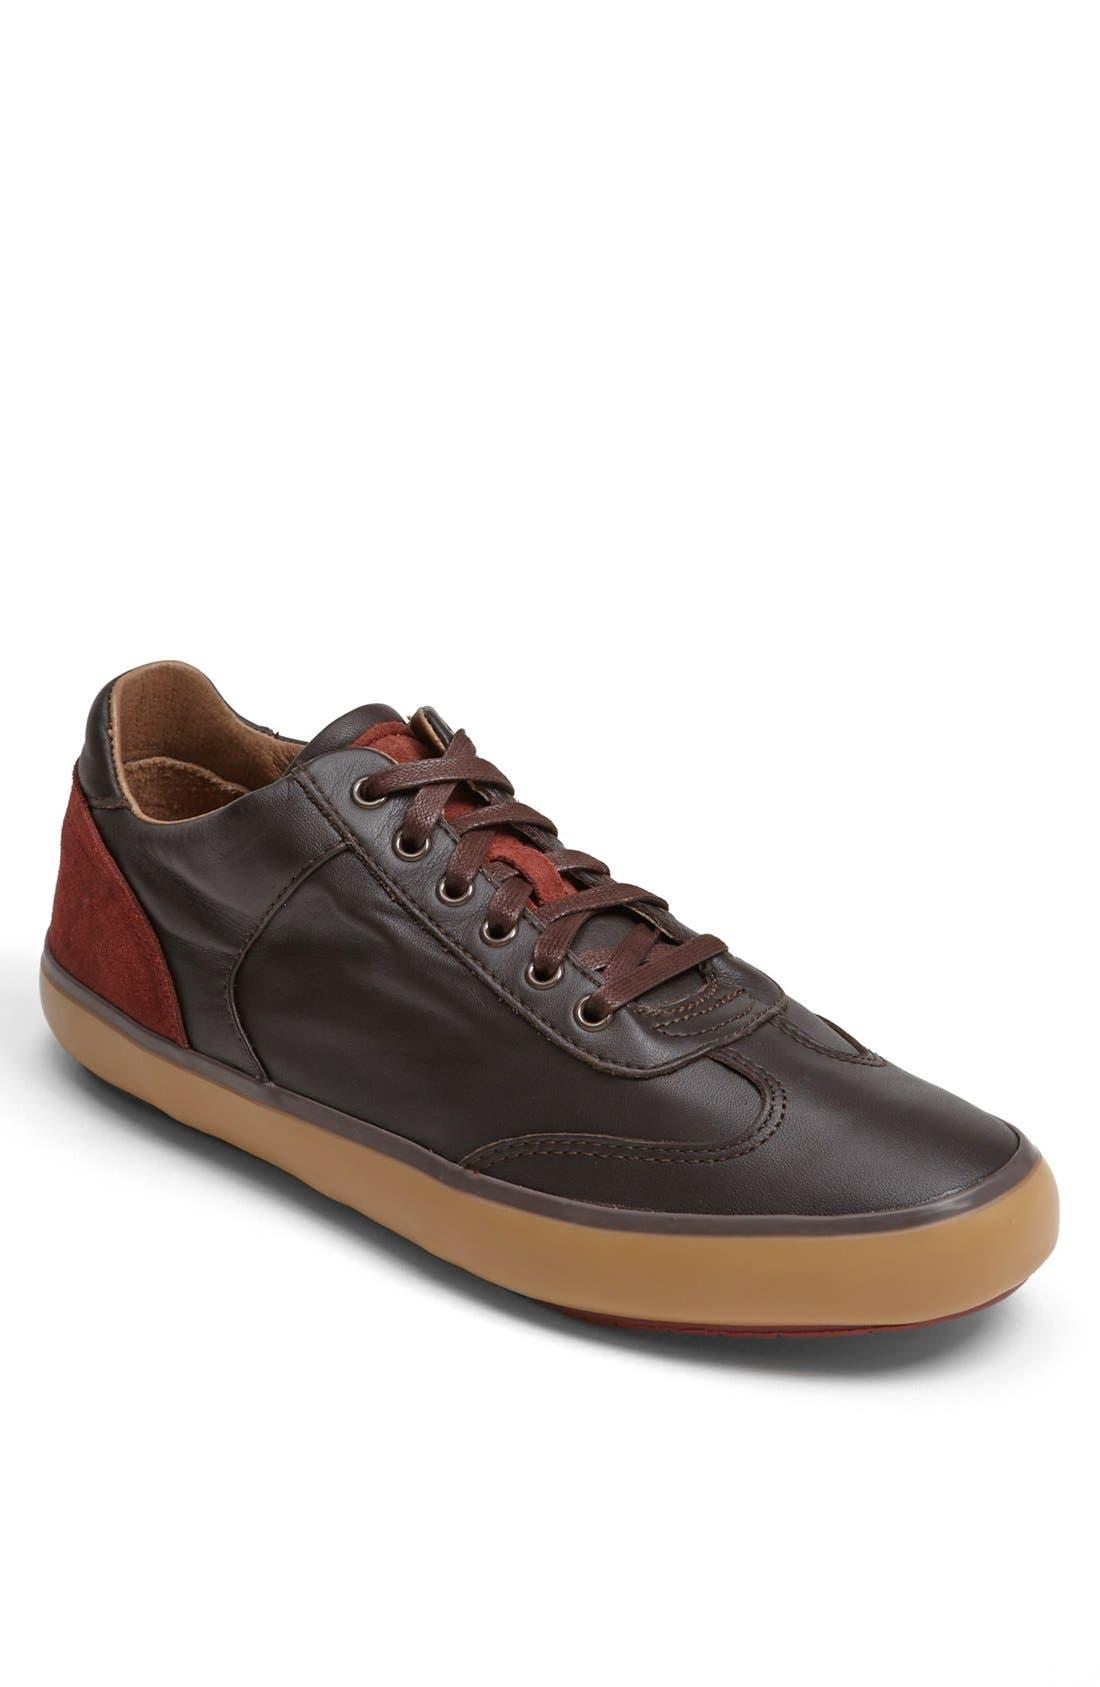 Alternate Image 1 Selected - Camper 'Portol' Sneaker